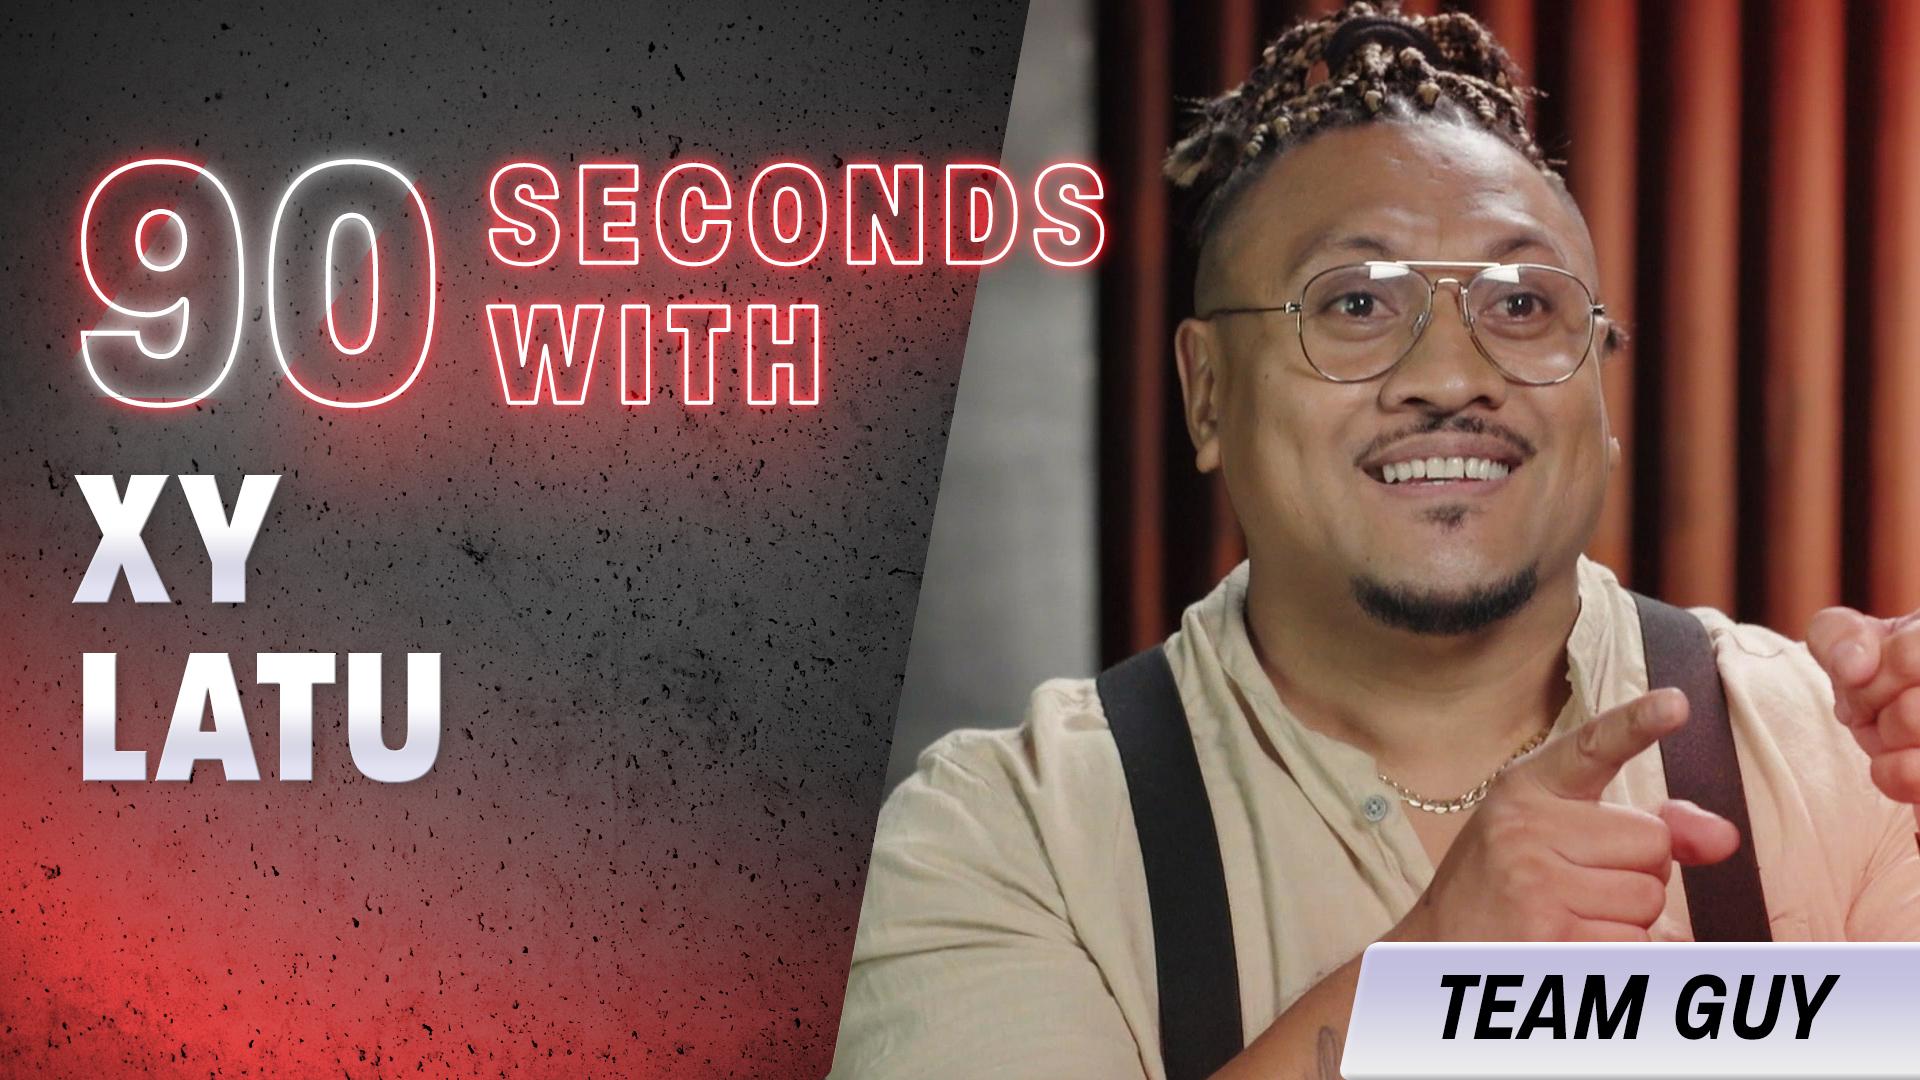 90 Seconds with Xy Latu